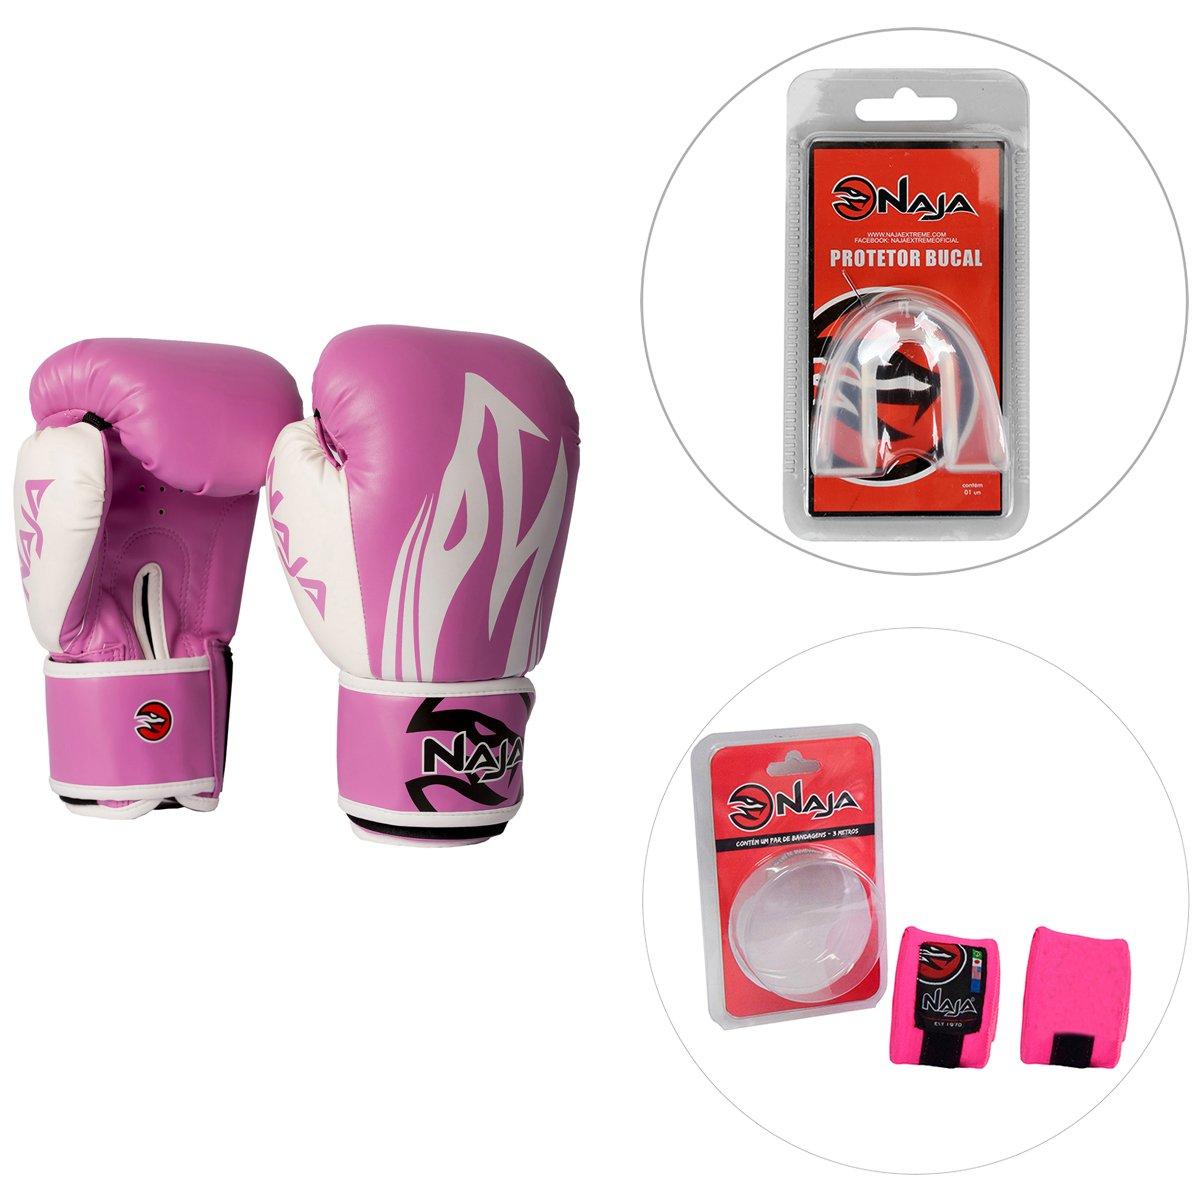 96775ad9b Kit Luva de Boxe   Muay Thai Naja Extreme 10OZ + Bandagem Elástica 3M +  Protetor Bucal - Compre Agora